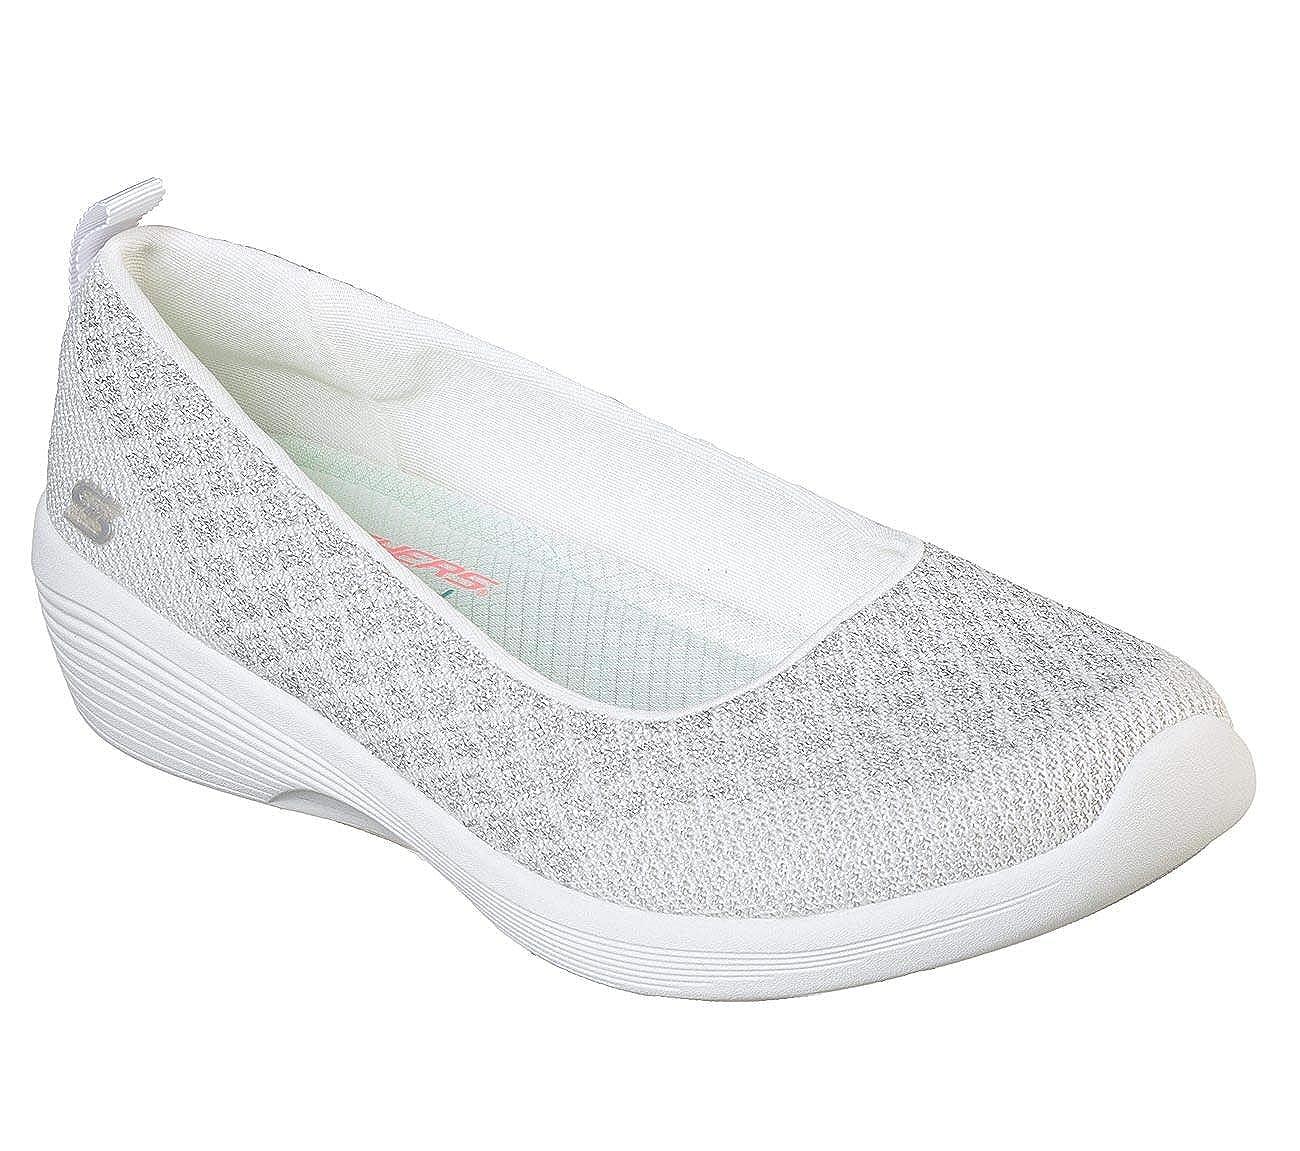 3171c95c06 Amazon.com   Skechers Arya in The Stars Womens Slip On Skimmer Sneakers    Fashion Sneakers